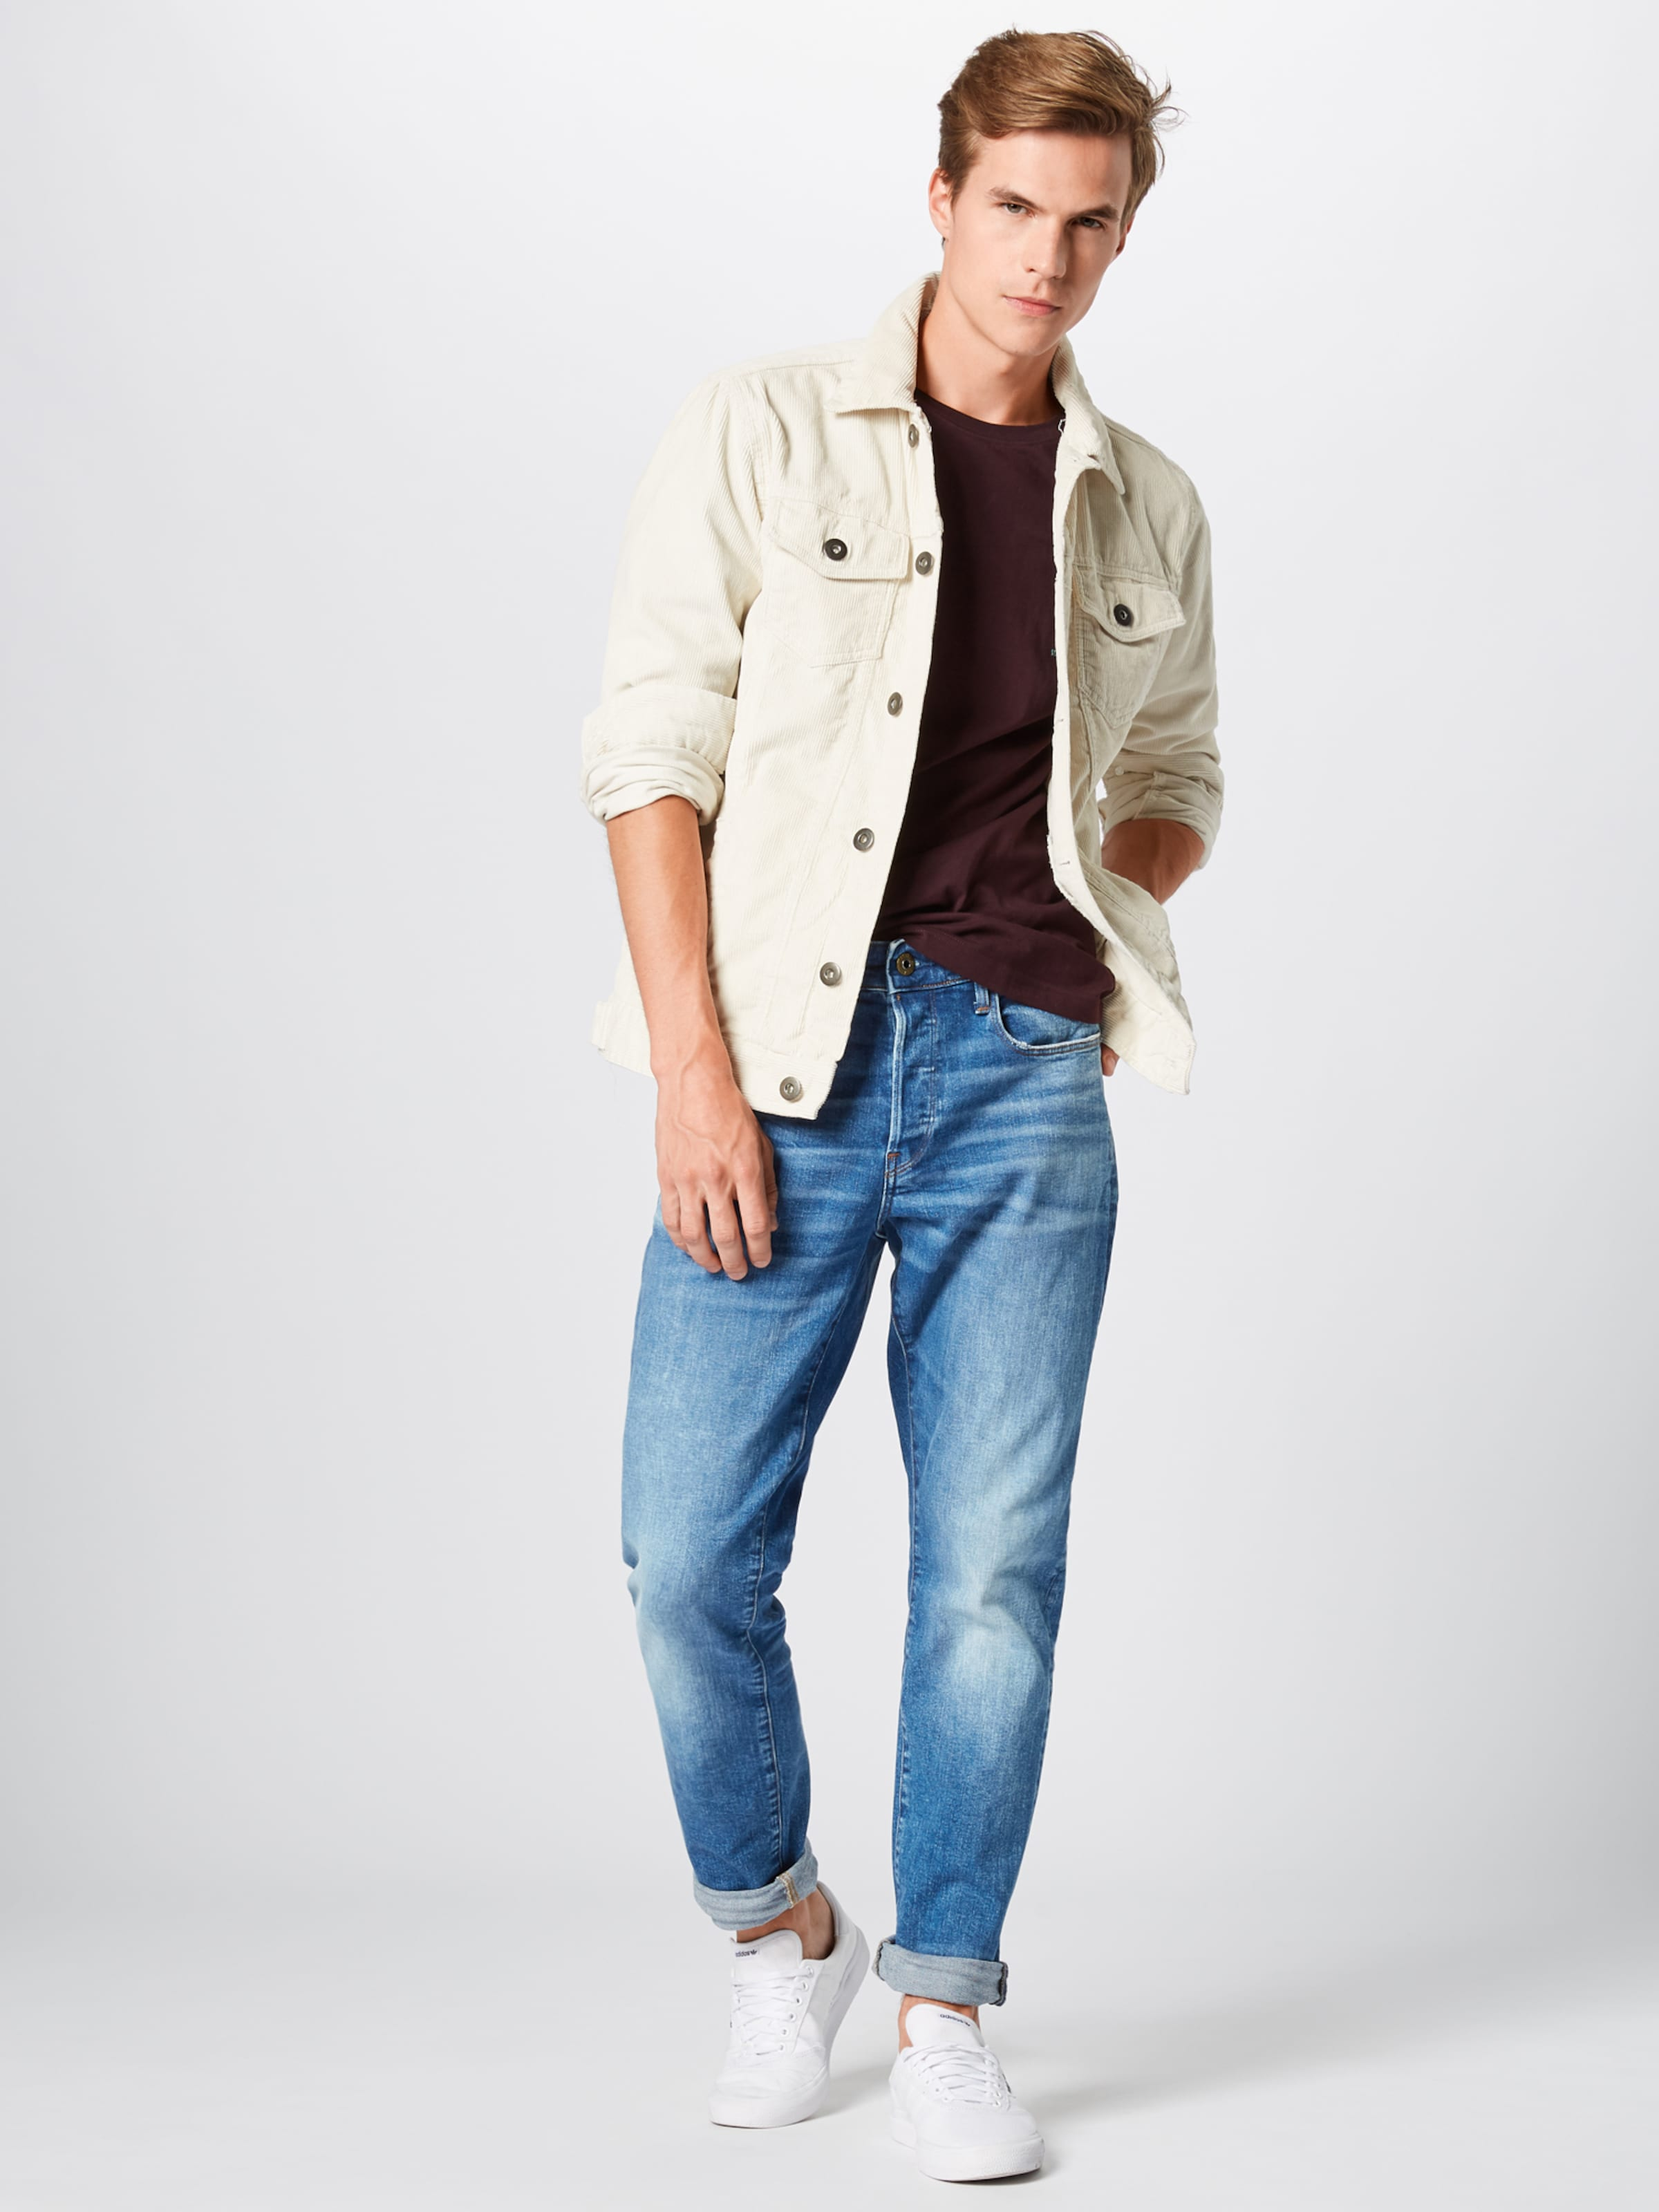 G '3301 Blue In Tapered' Raw star Denim Jeans qSMVGzpU